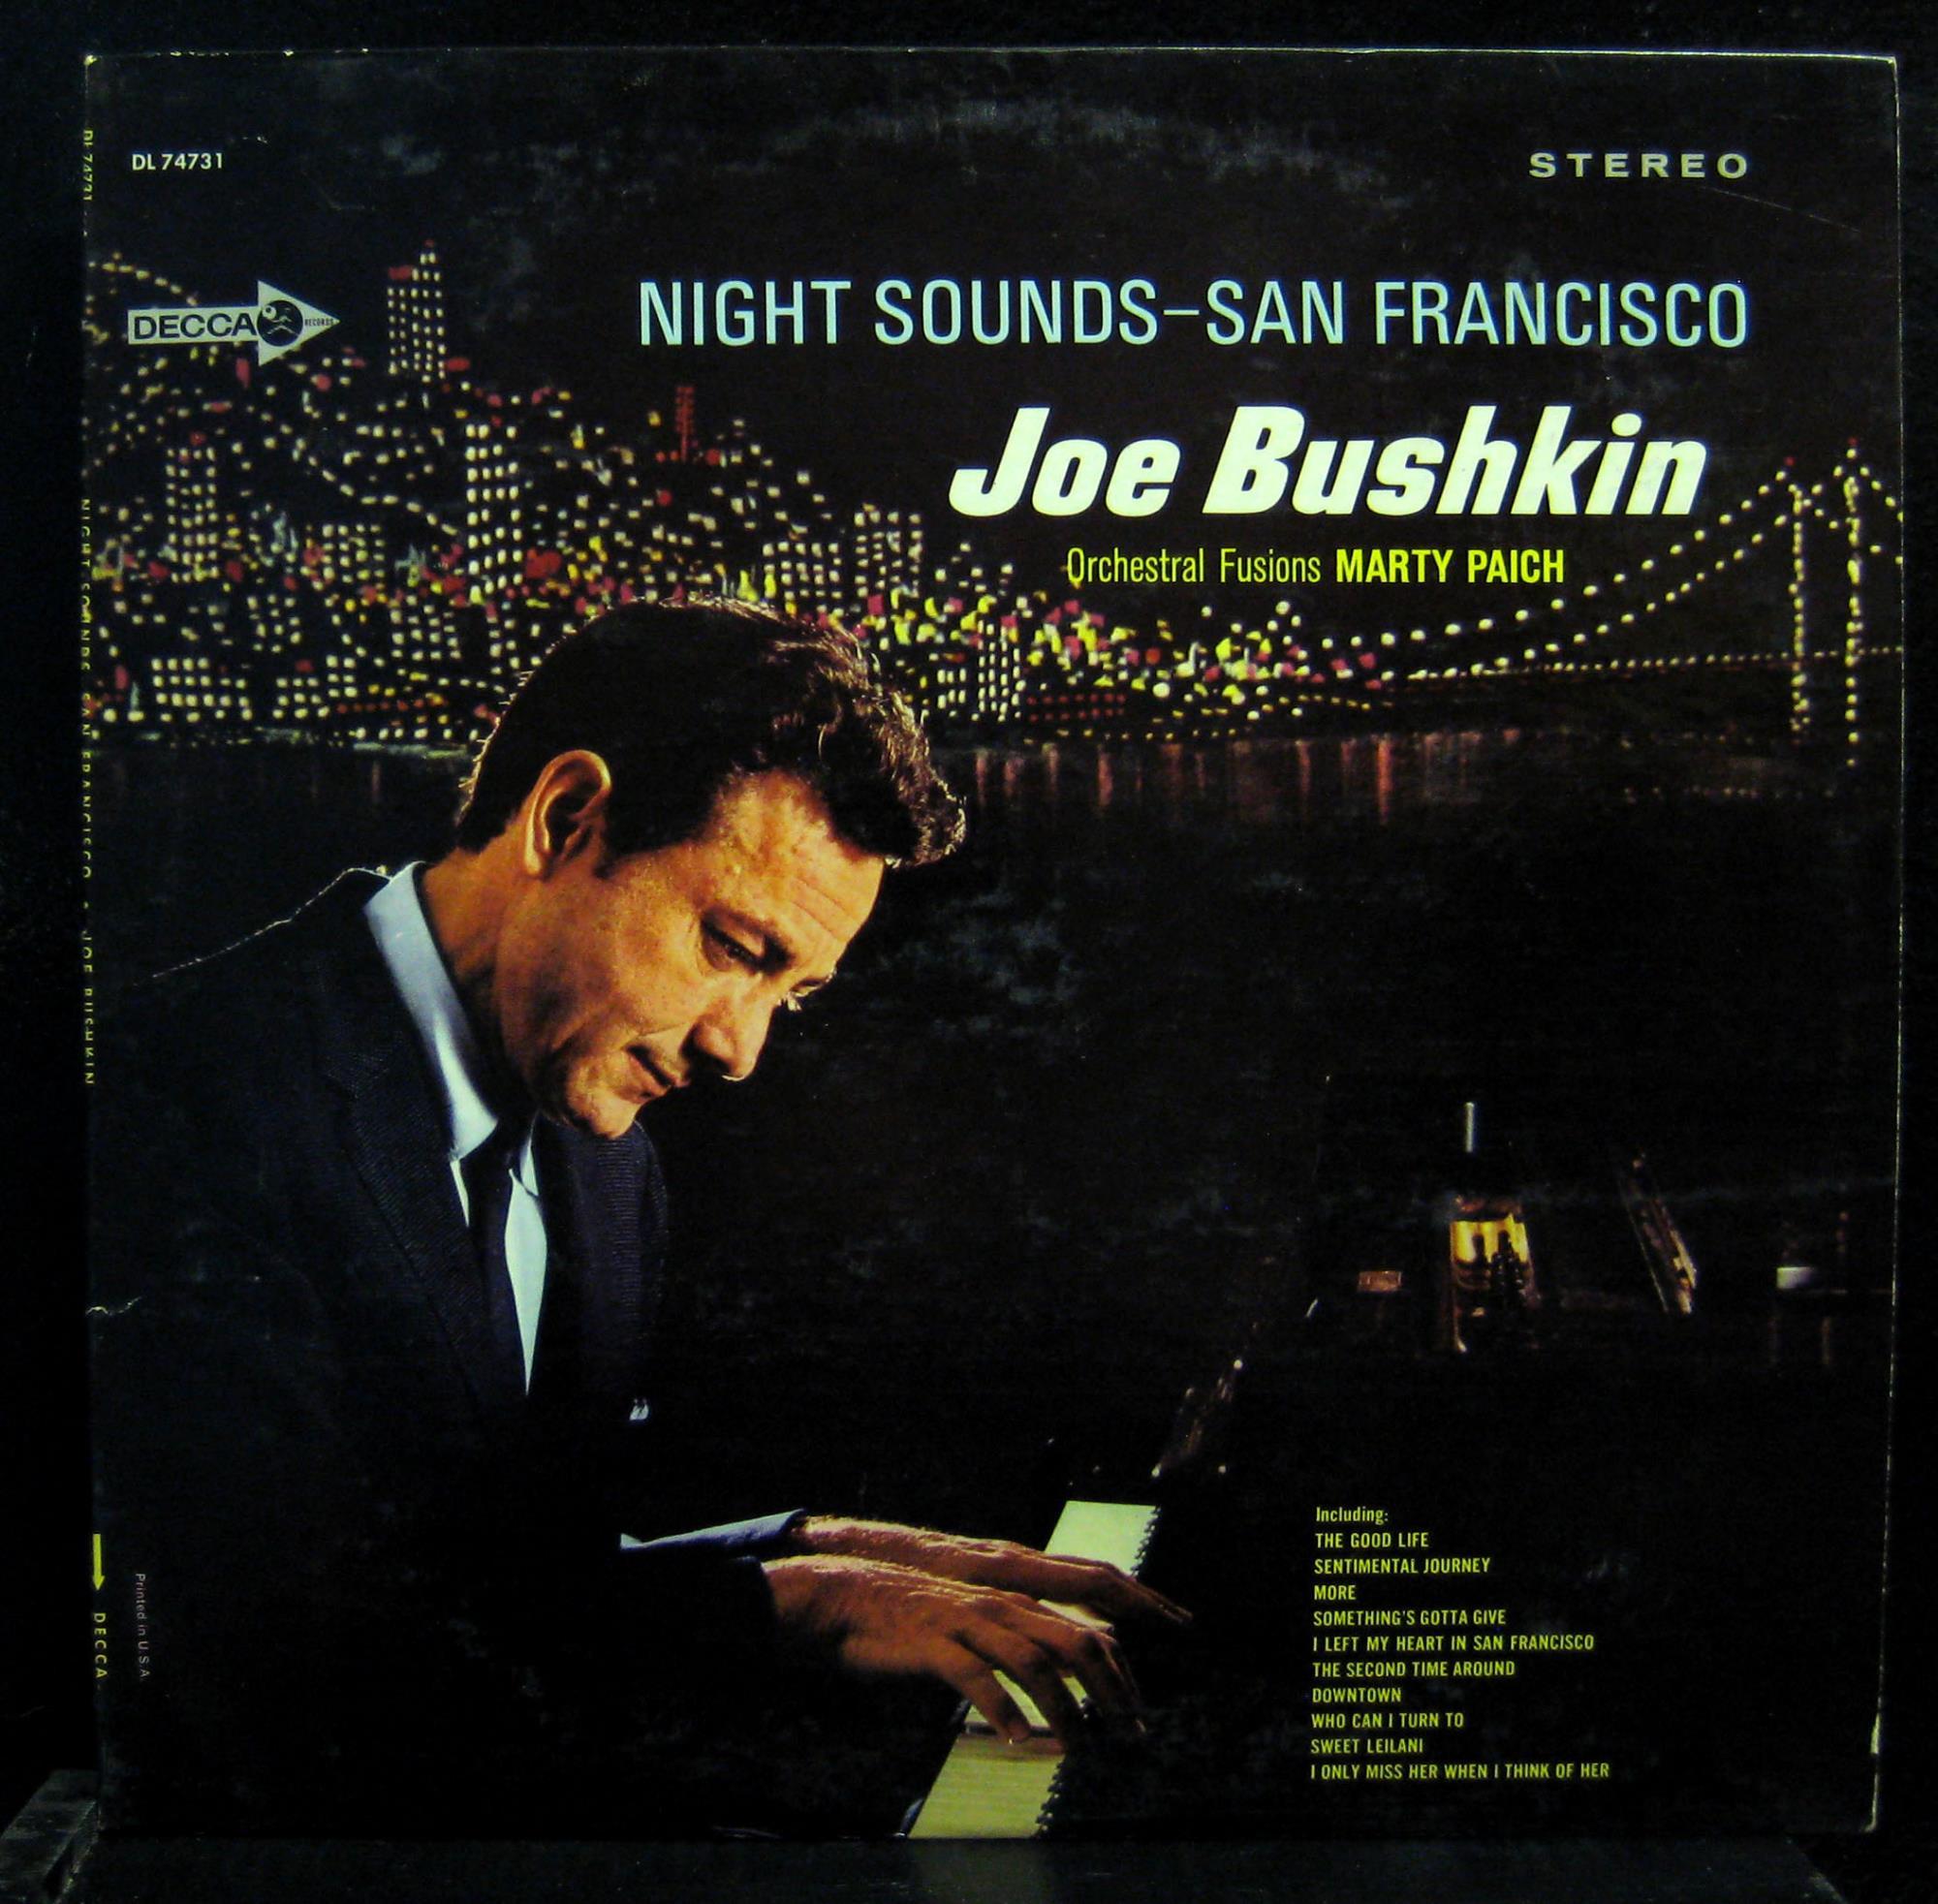 Joe Bushkin Net Worth